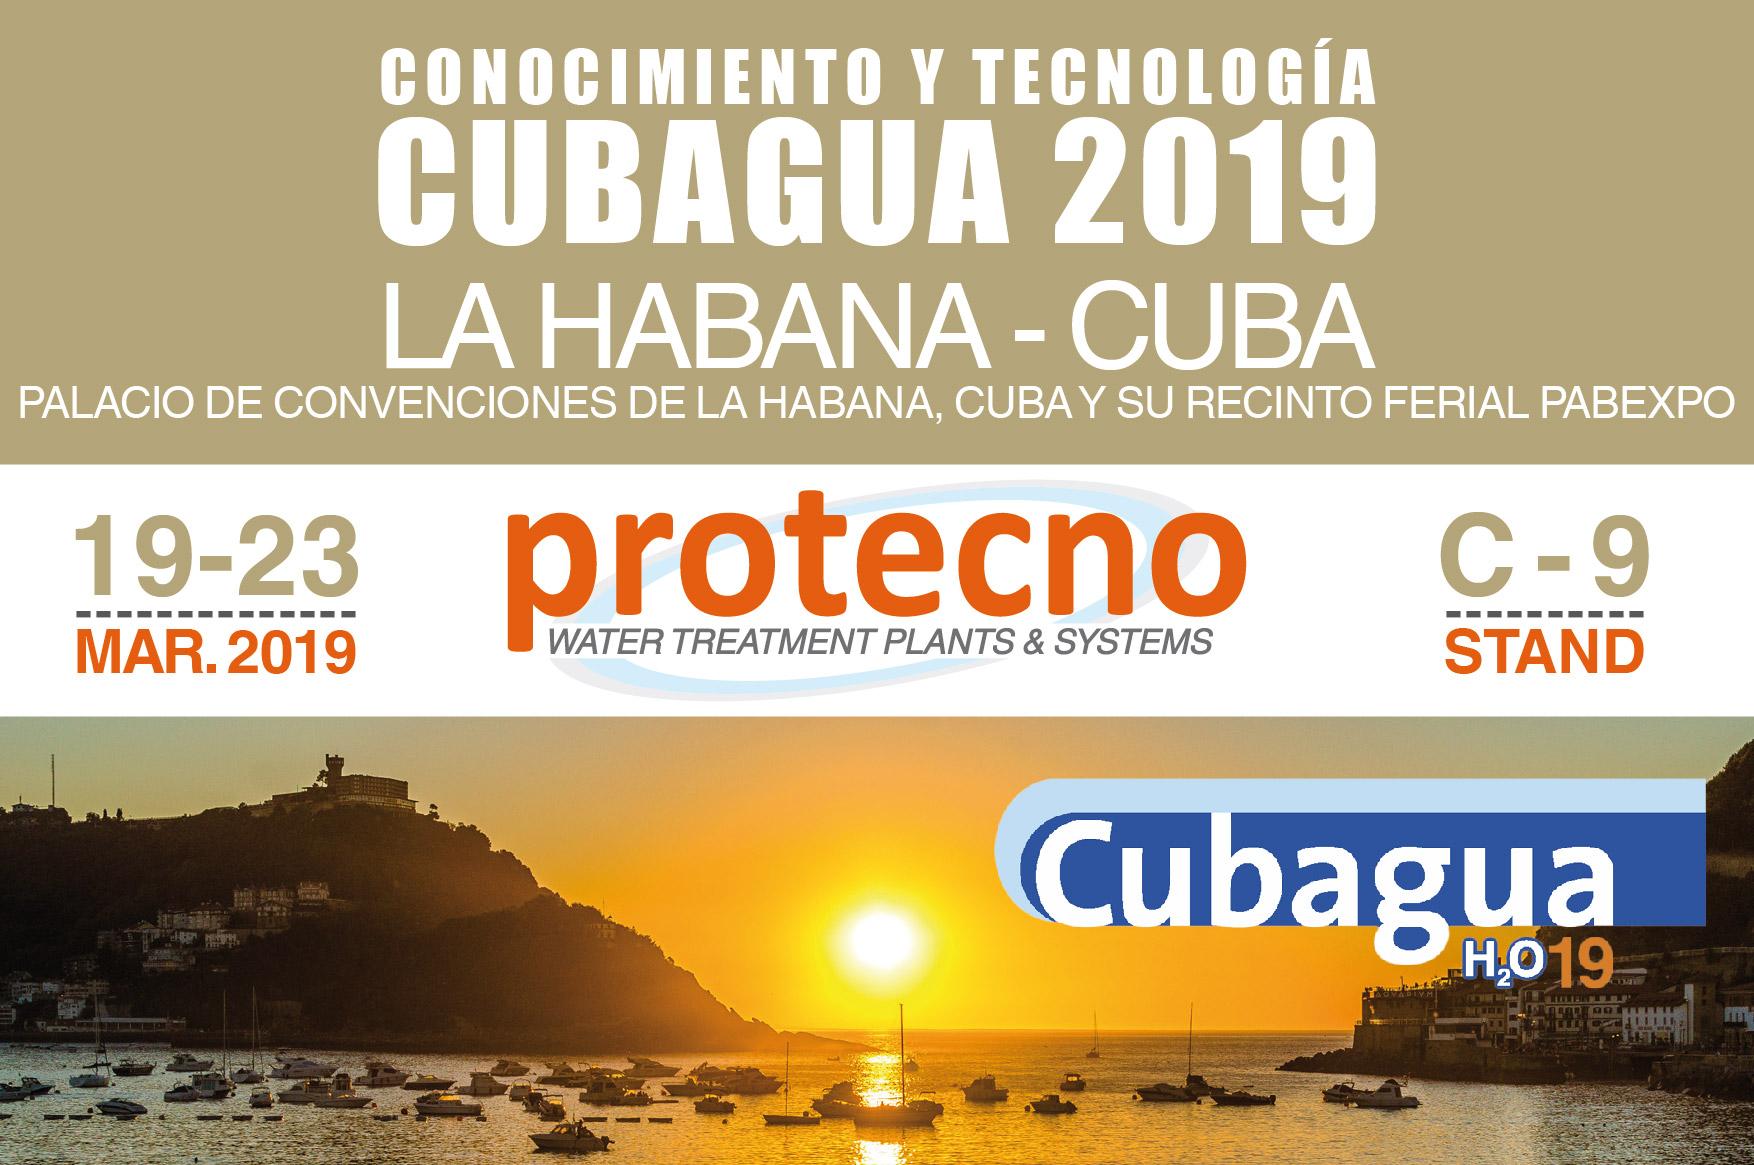 CUBAGUA 2019! MARCH 19-23, LA HABANA.